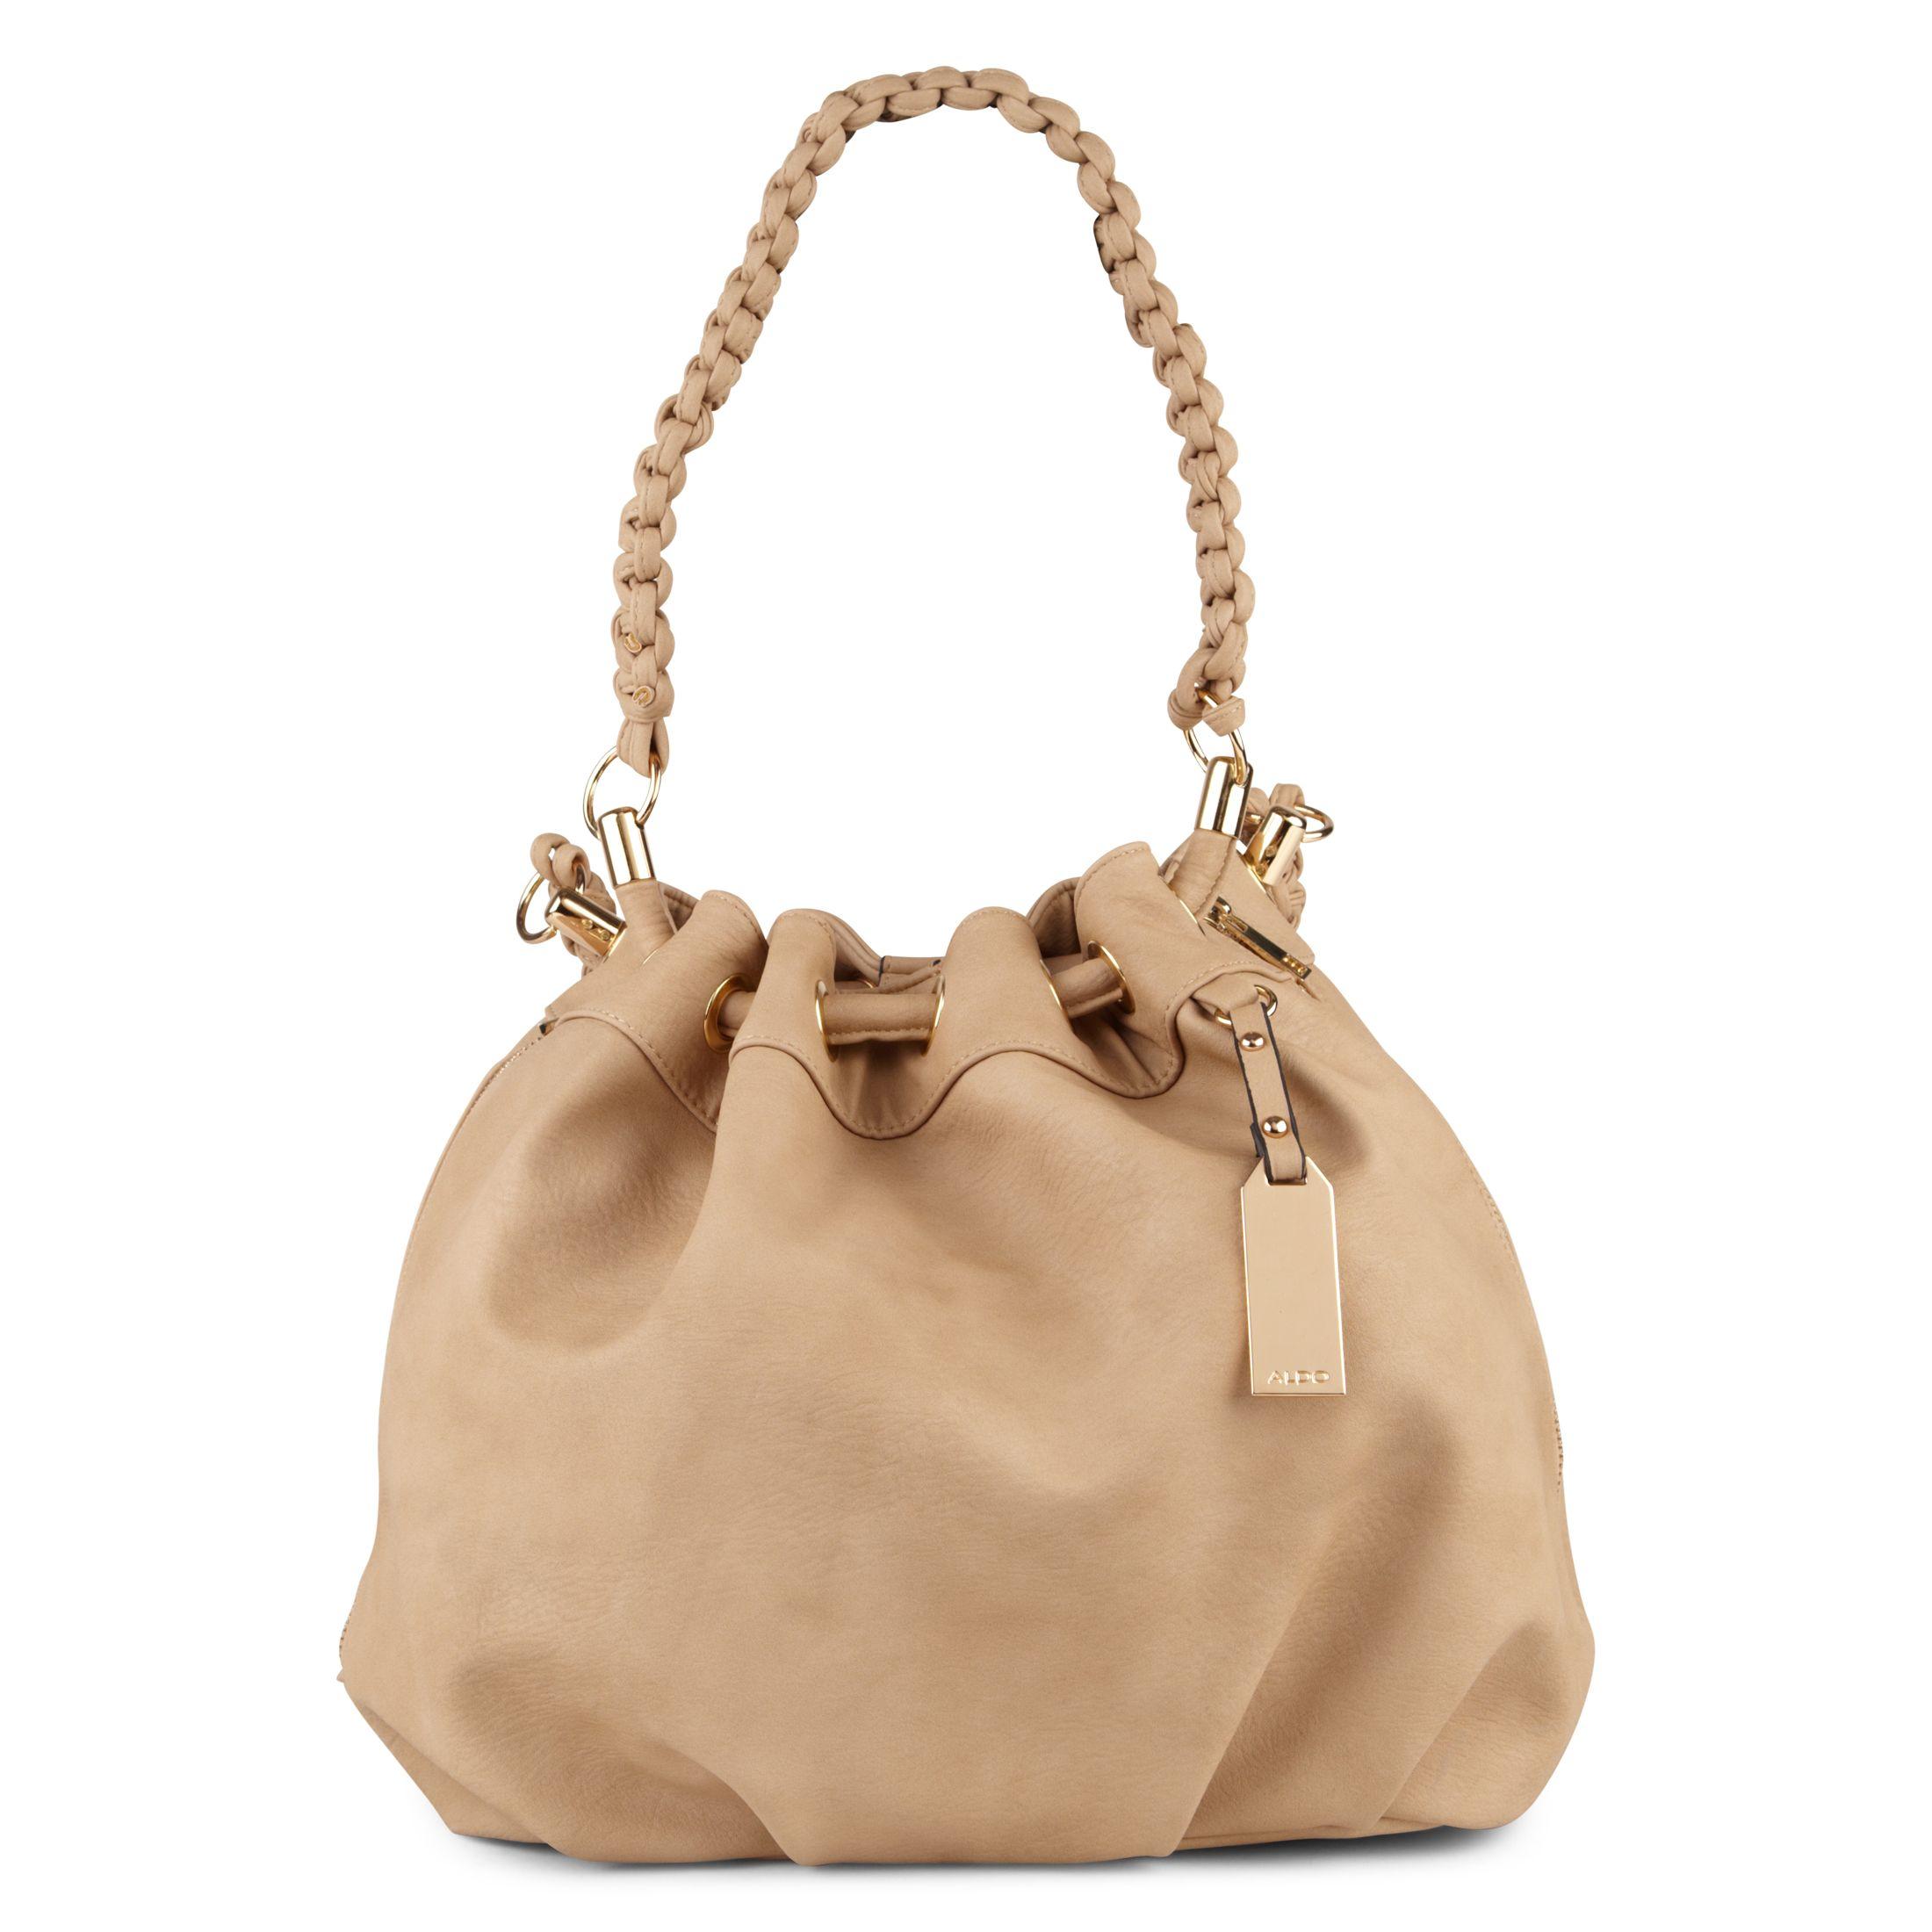 Aldo Whitepine Drawstring Satchel Bag in Brown | Lyst